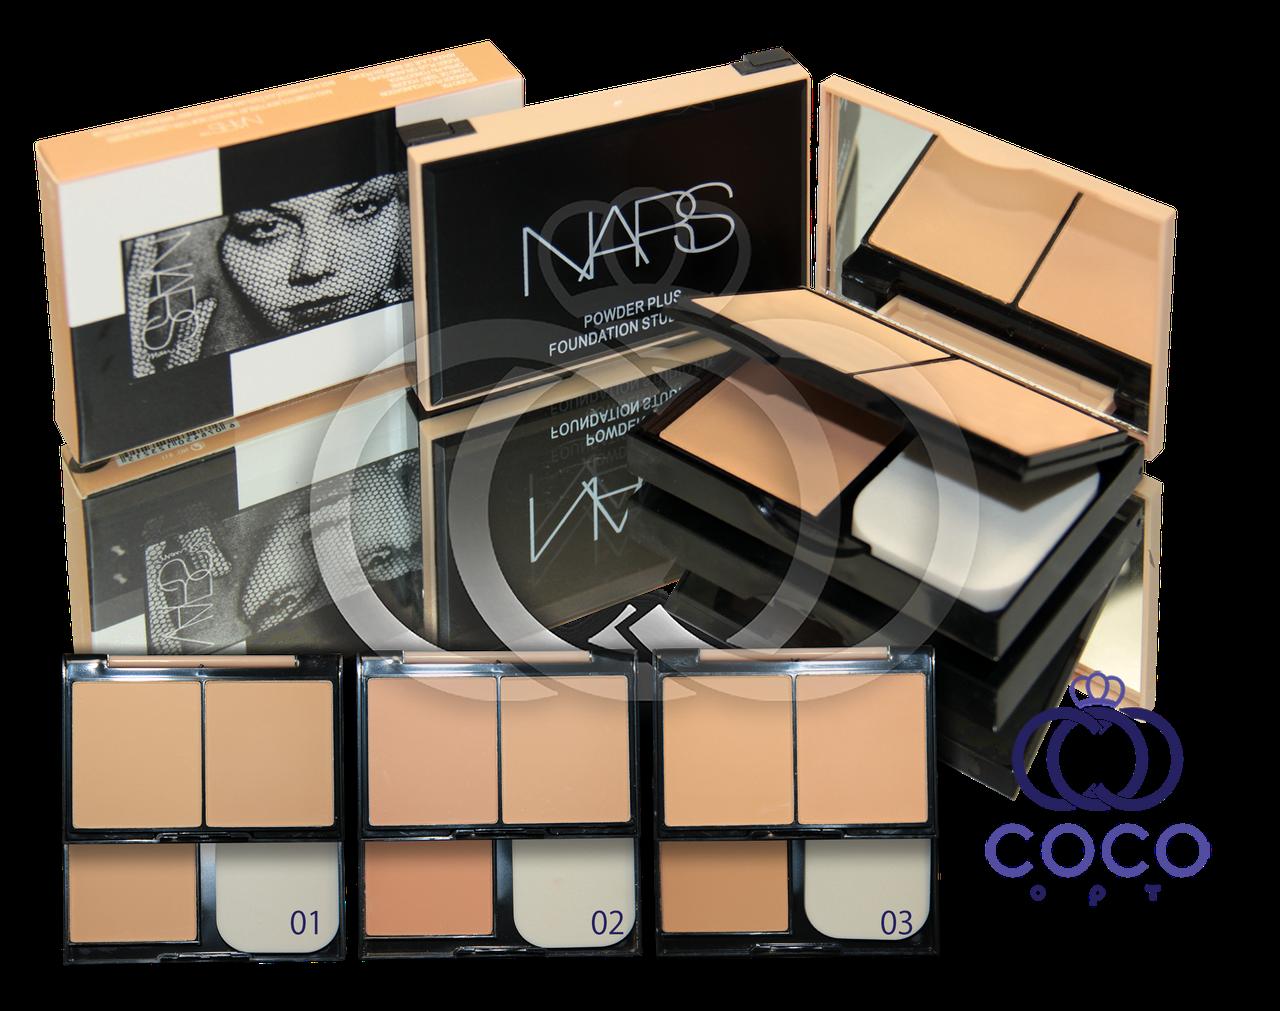 Компактная пудра Nars Powder Plus Foundation Studio Fix